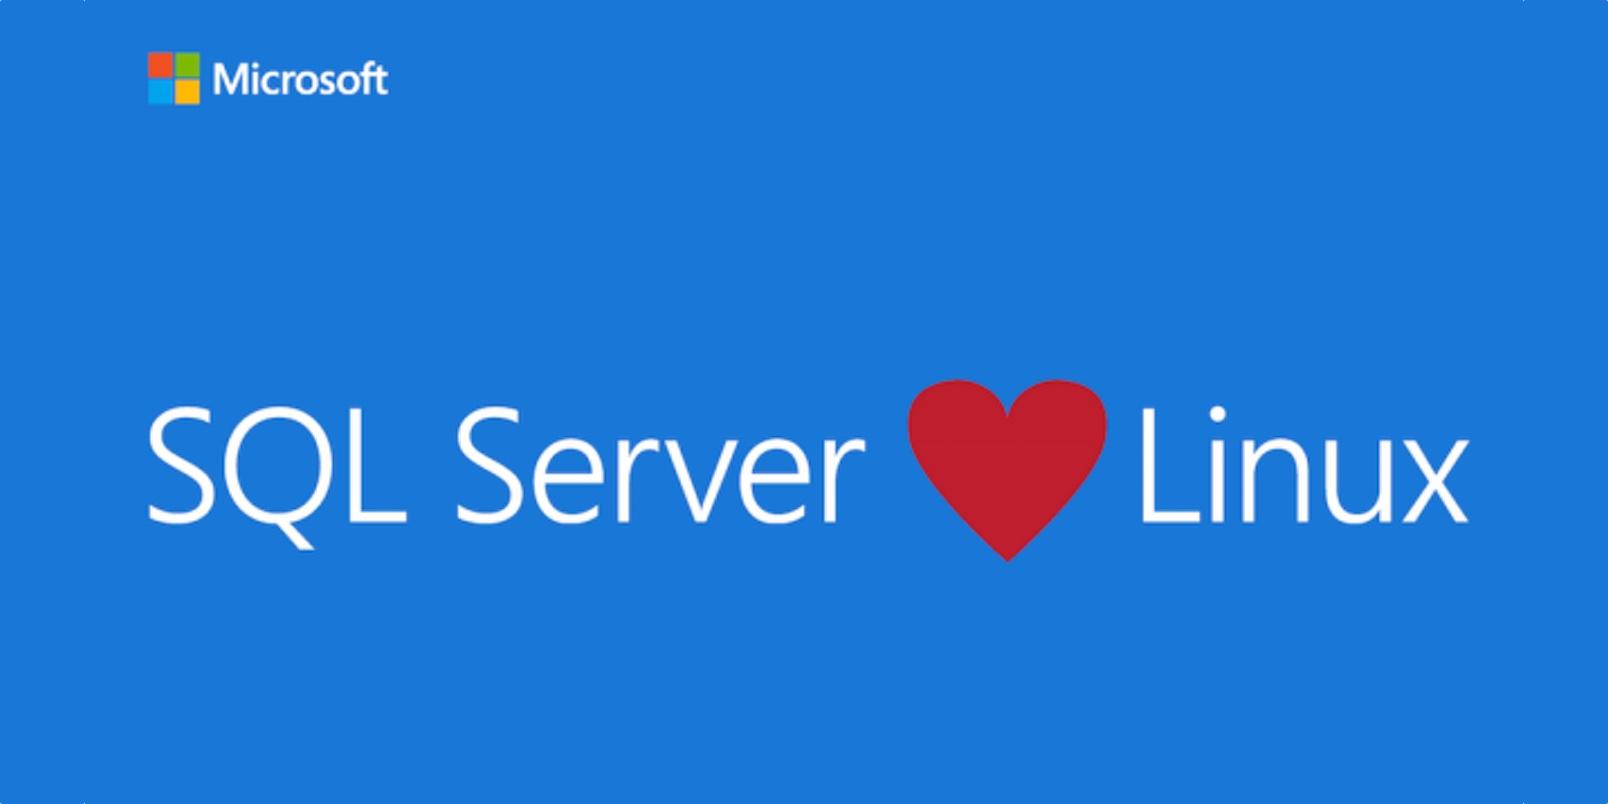 Microsoft is bringing SQL Server to Linux